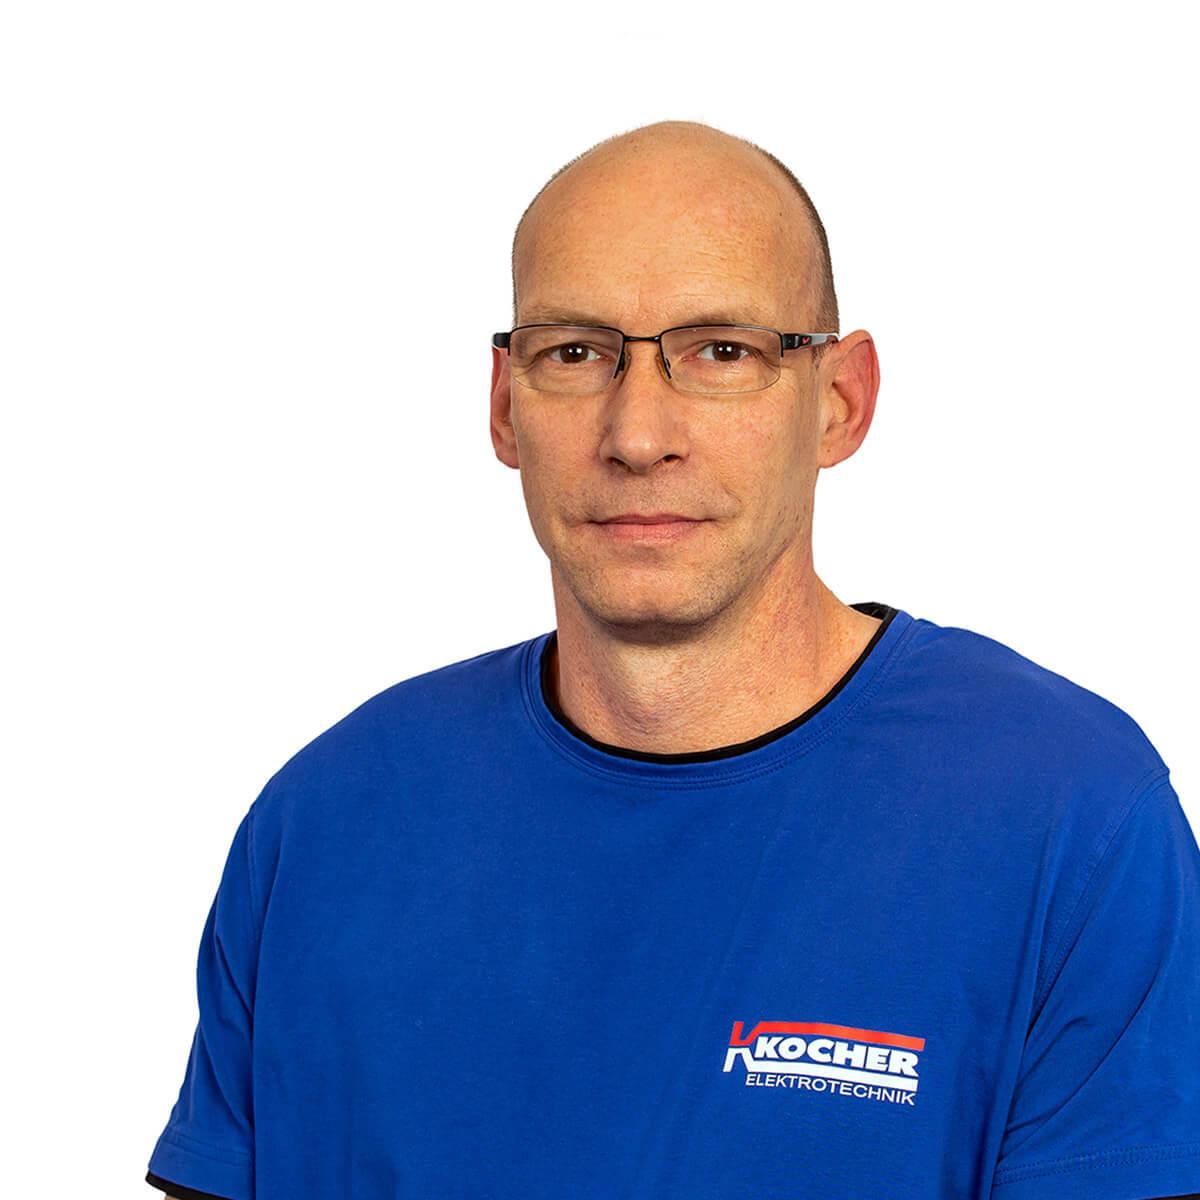 Heiko Schmidt Kocher Elektrotechnik